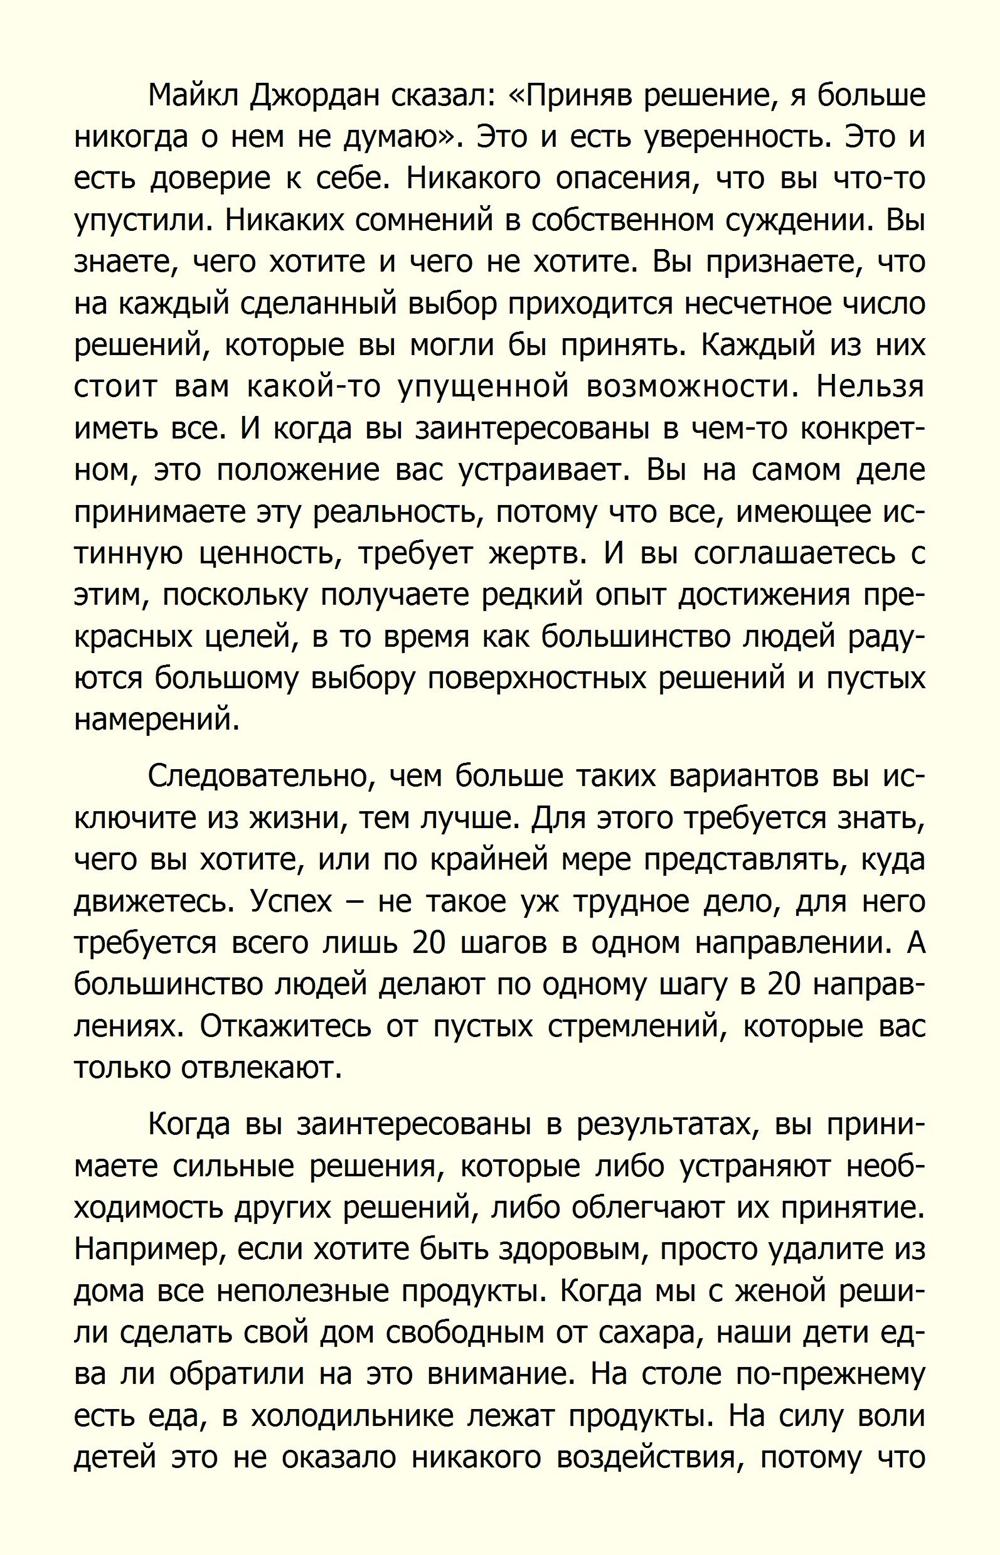 http://ipic.su/img/img7/fs/Silavolinerabotaet_191.1579720188.jpg